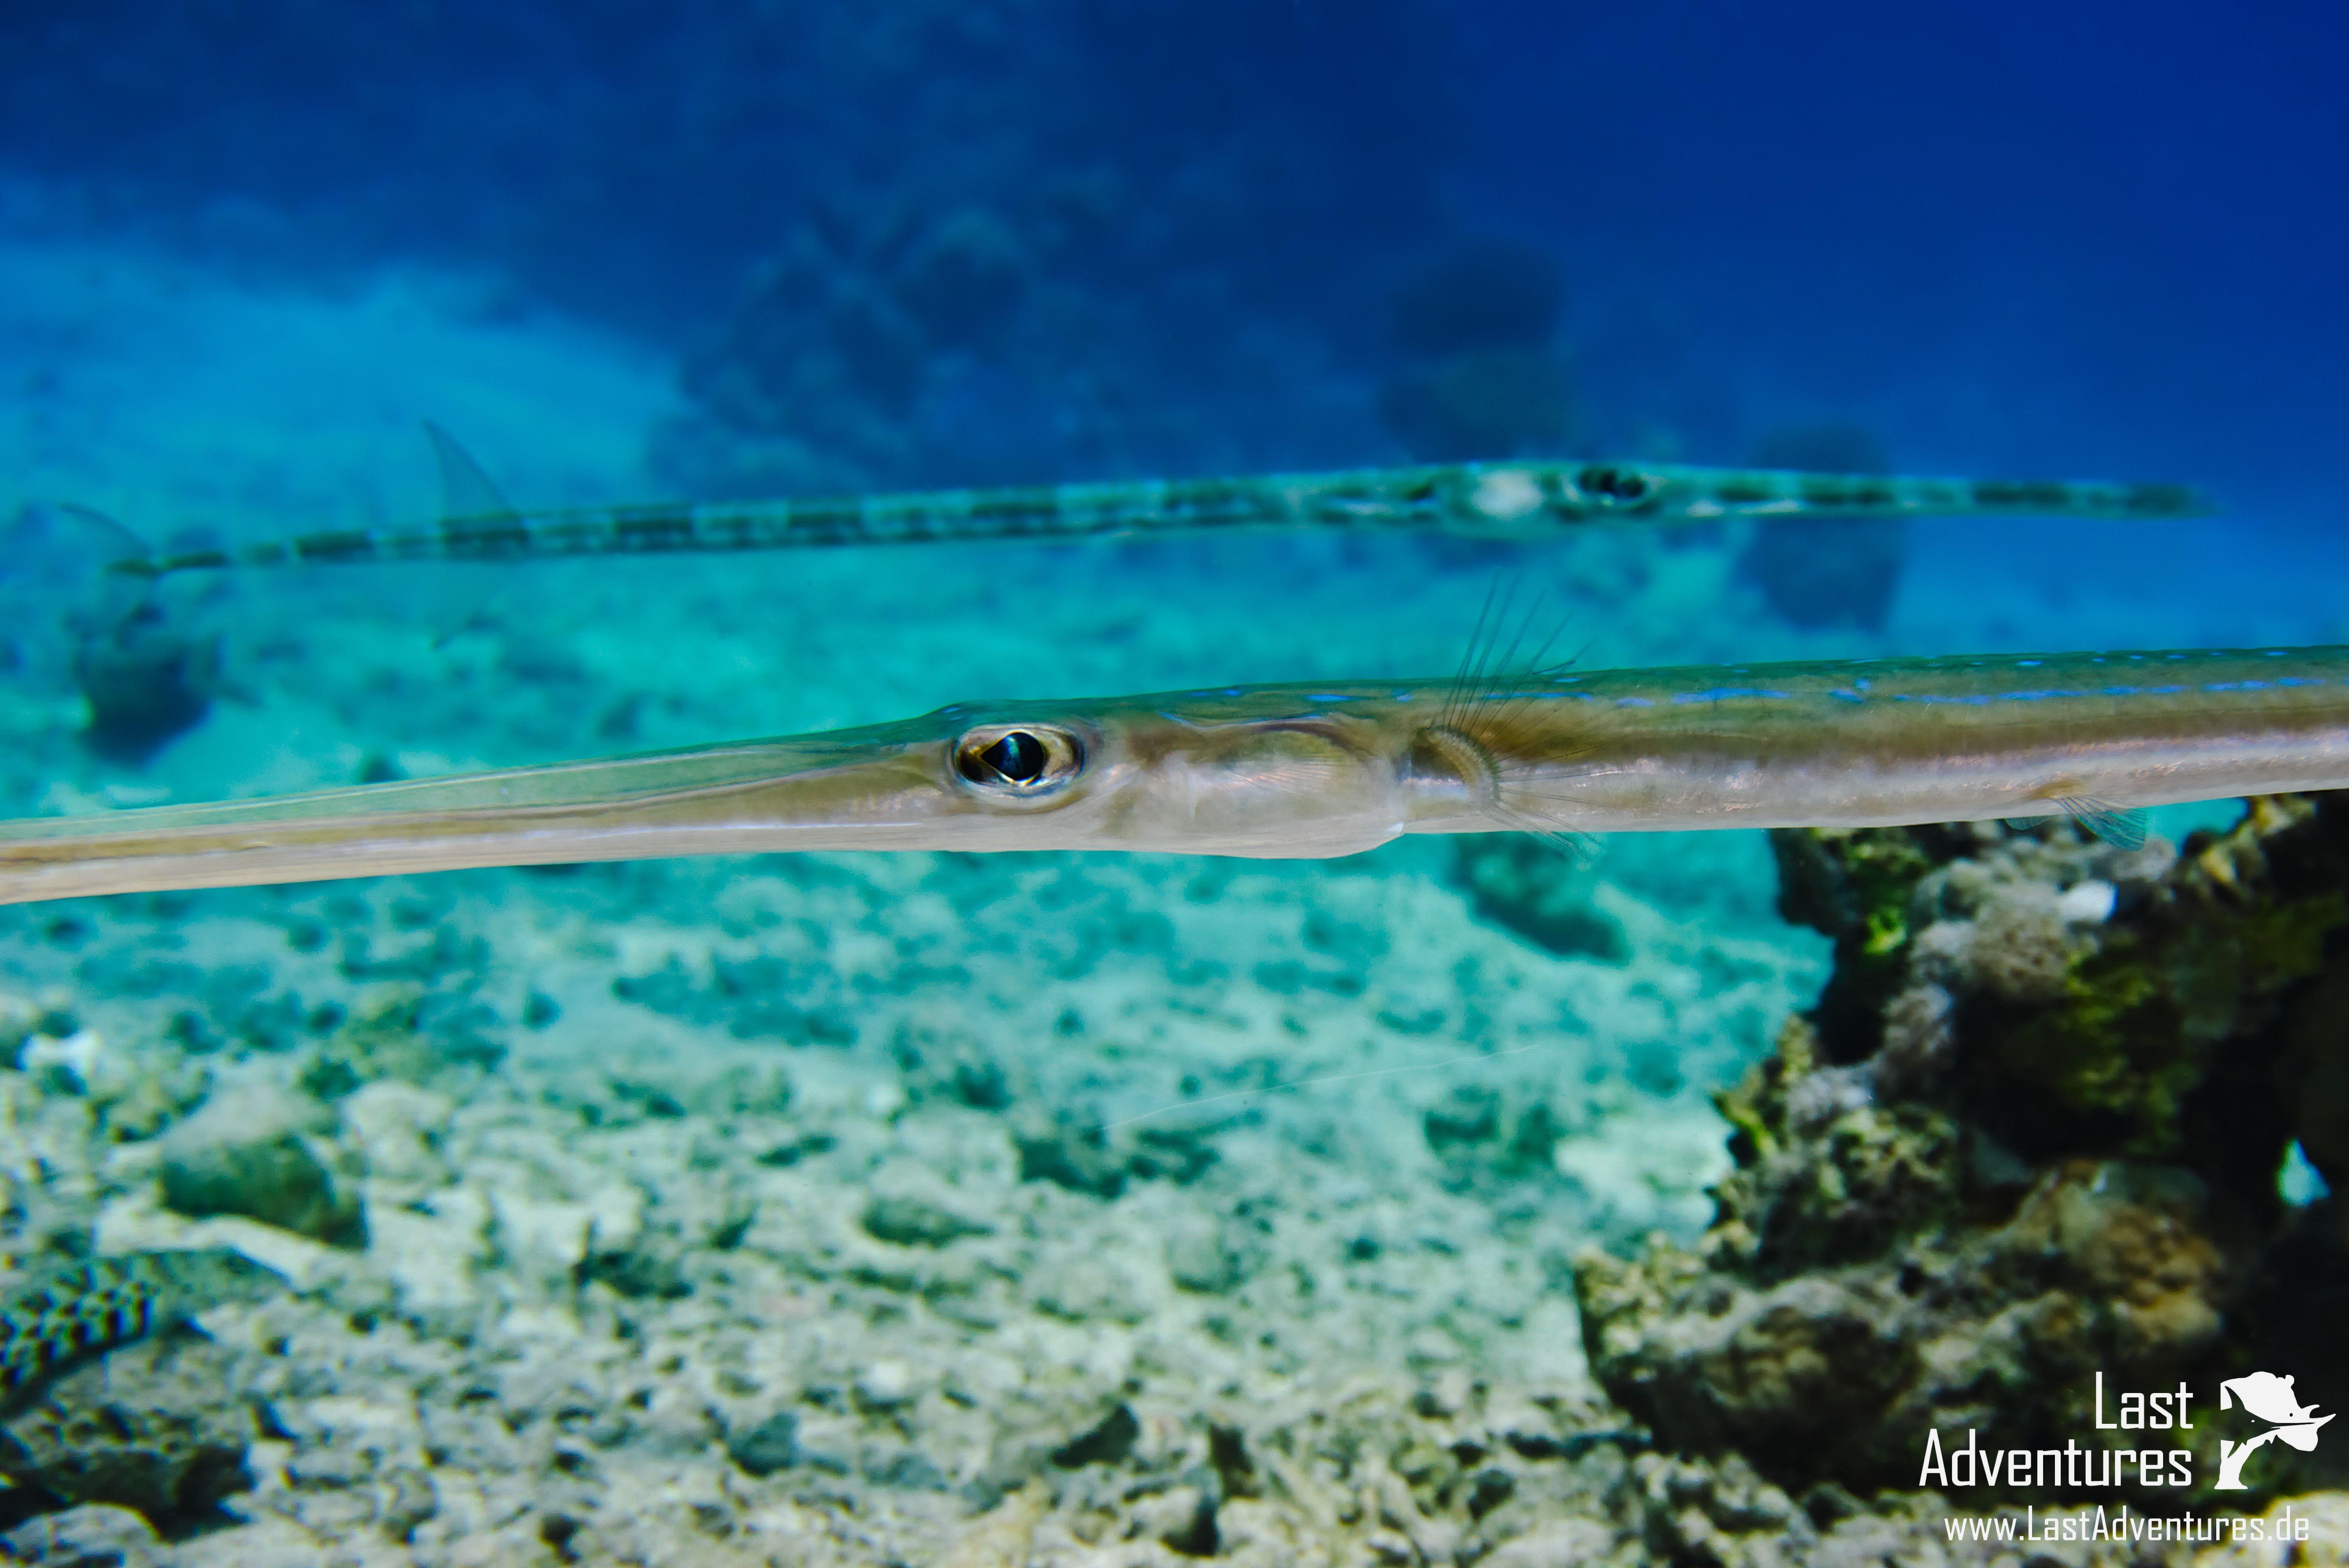 Flötenfisch fotografiert in Ägypten # Flötenfisch #Cornetfish #fisch ...